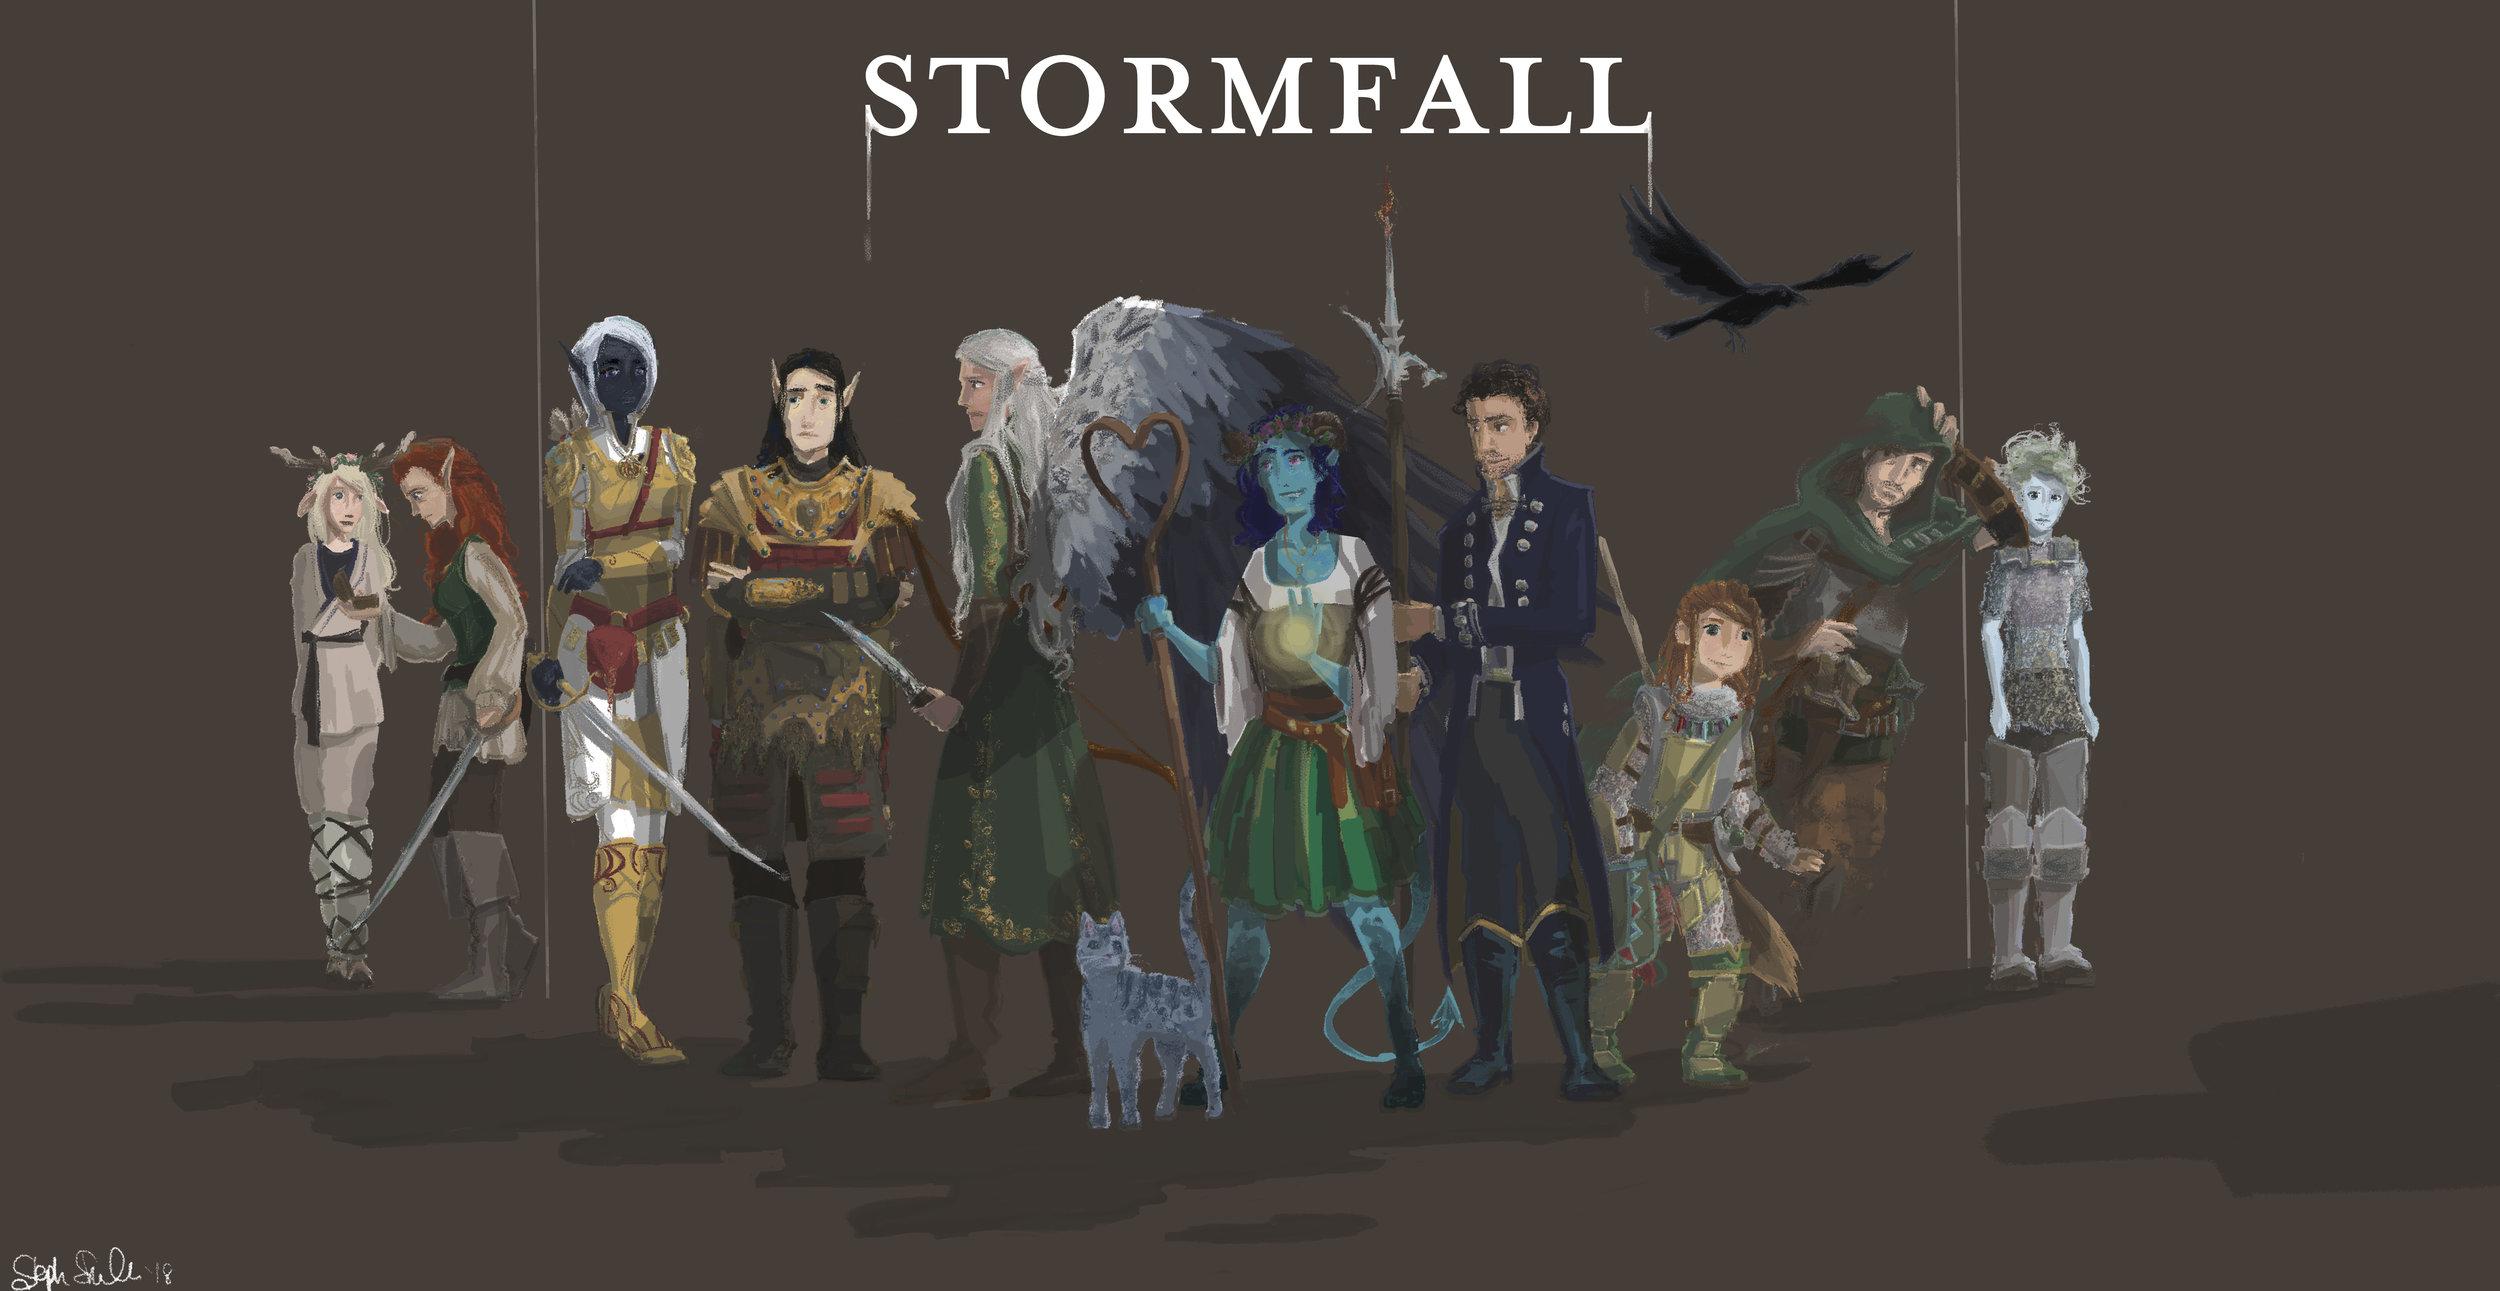 Stormfall DnD Group Illustration